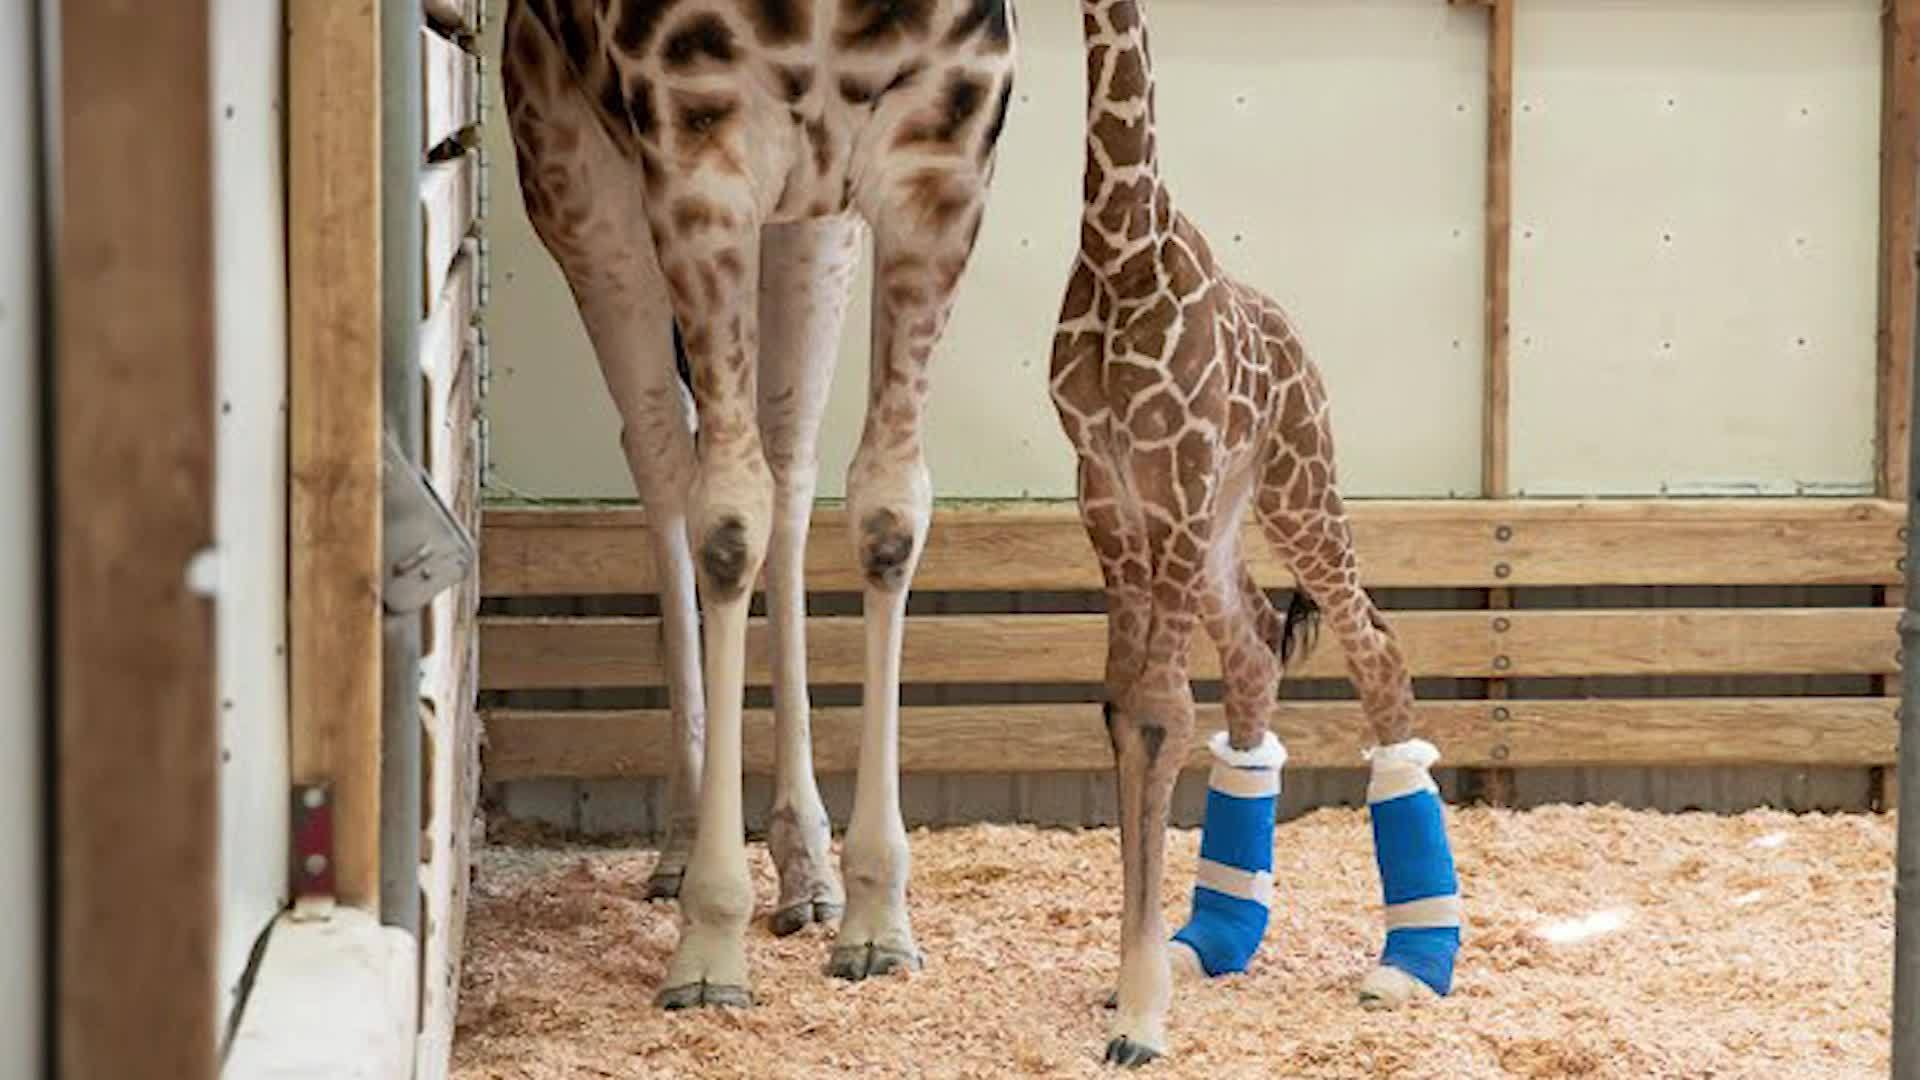 Washington__Baby_giraffe_gets_therapeuti_2_20190508203030